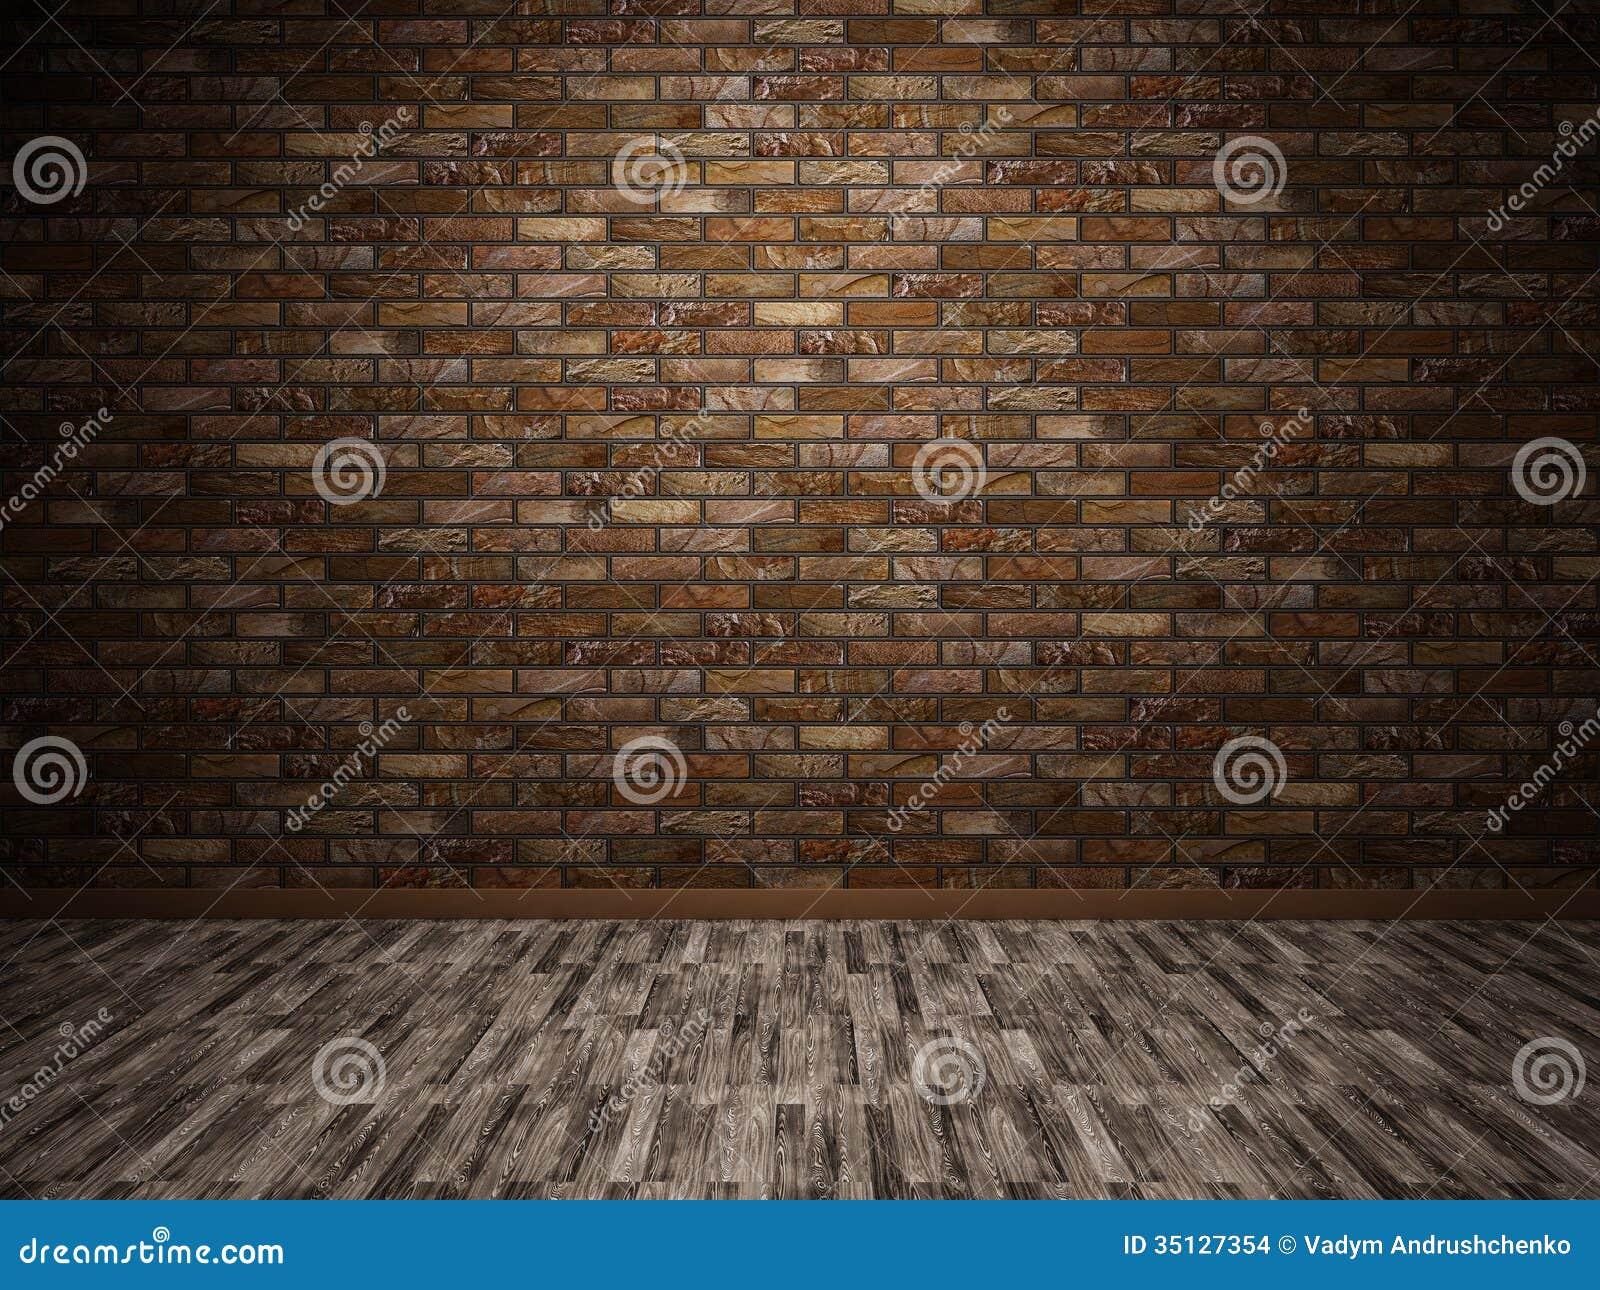 Interior Brick Flooring Pricing : Interior with brick wall stock illustration image of